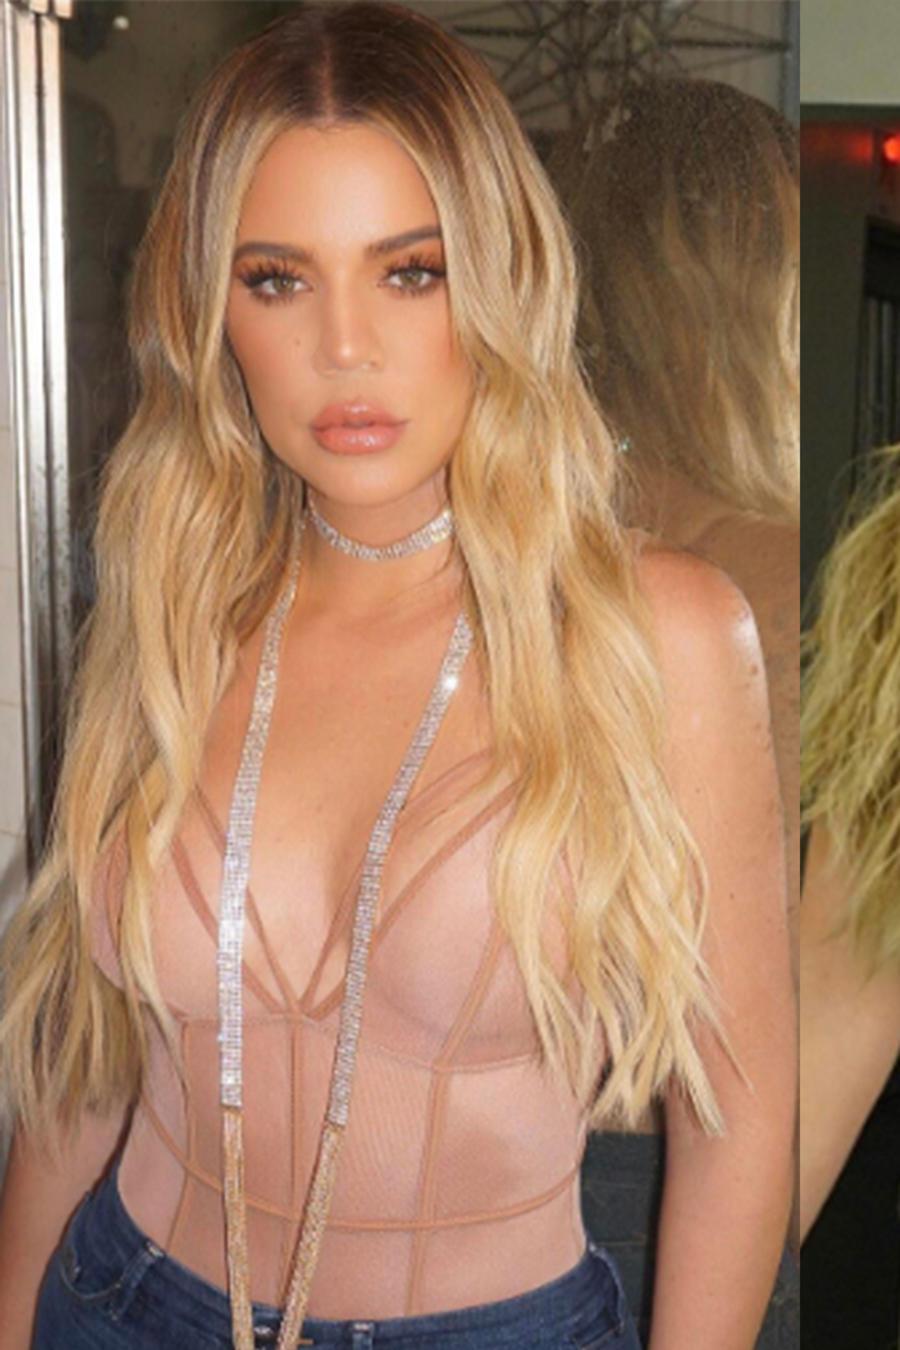 Collage de fotos de Khloé Kardashian.